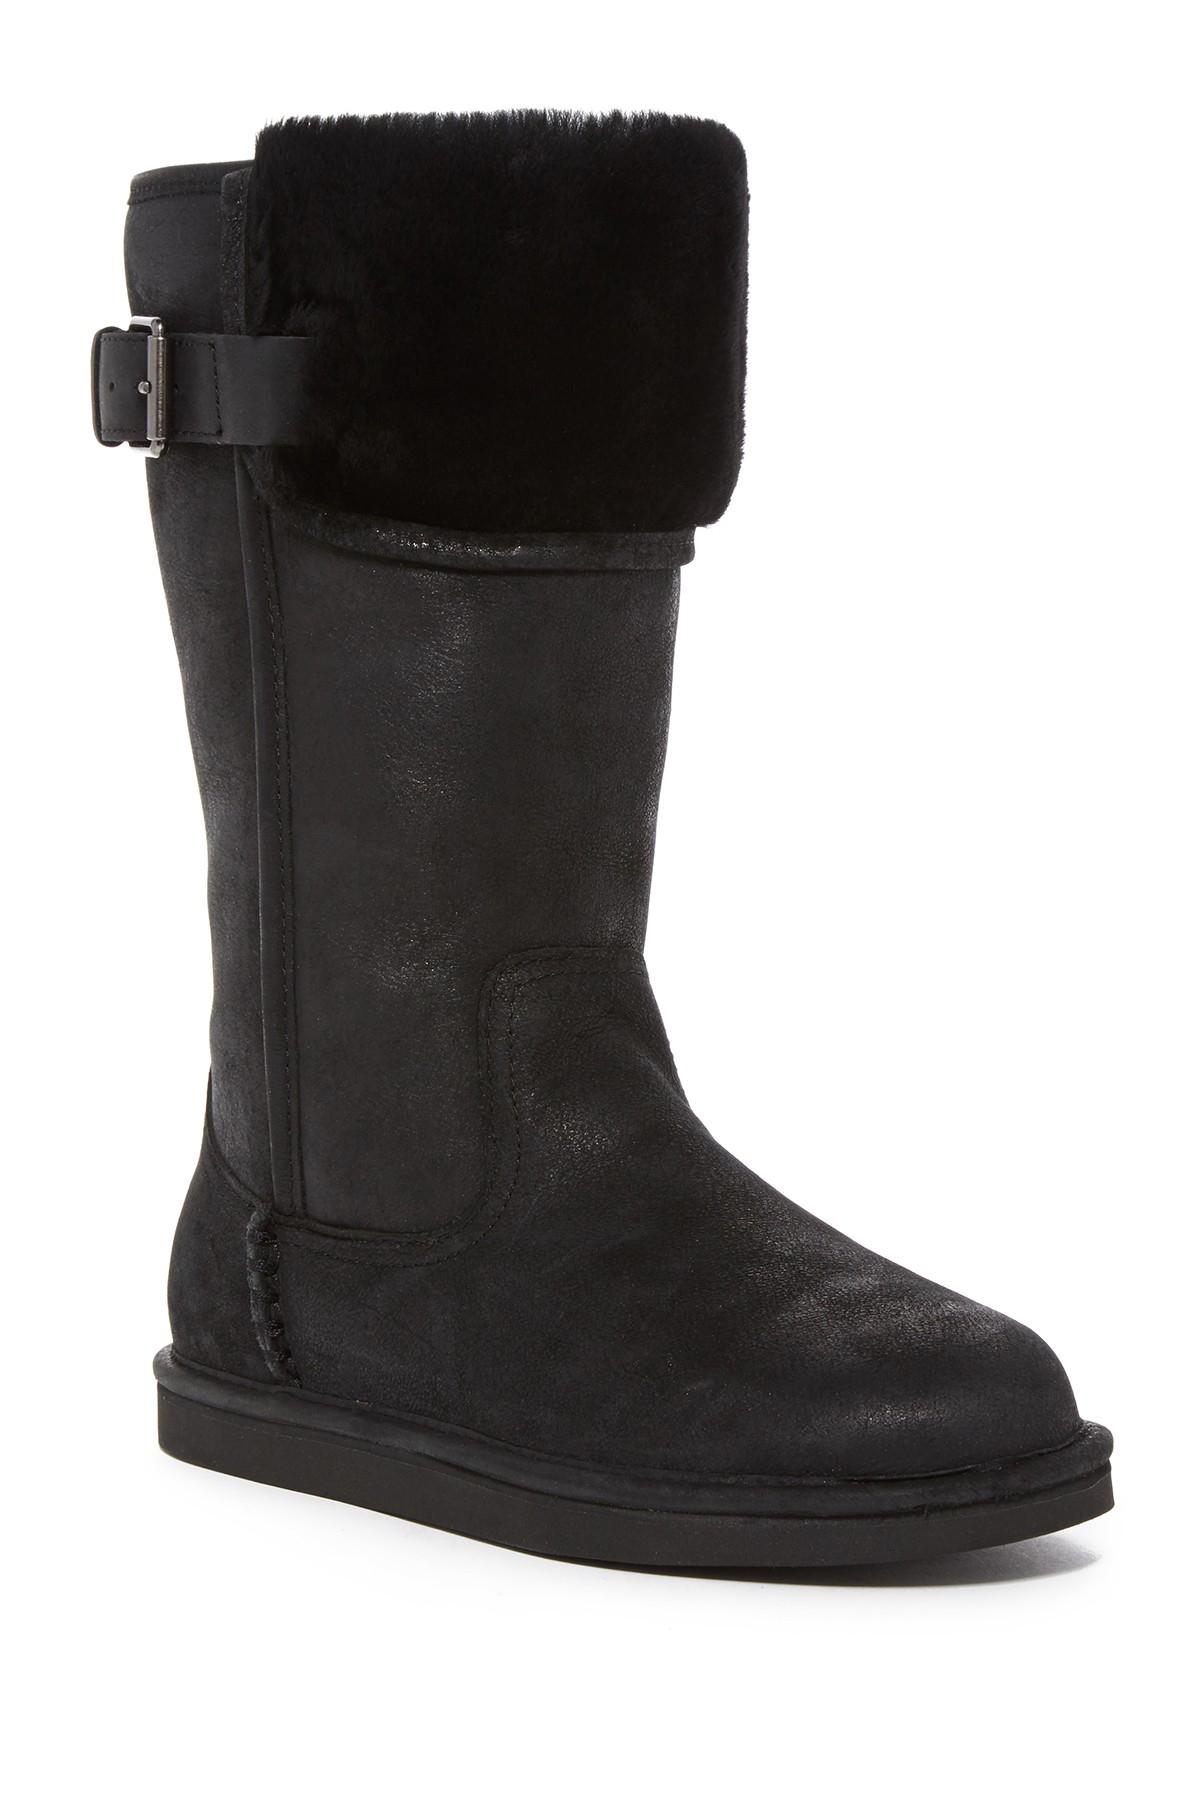 Ugg Wilowe Genuine Sheepskin Cuff Boot in Black